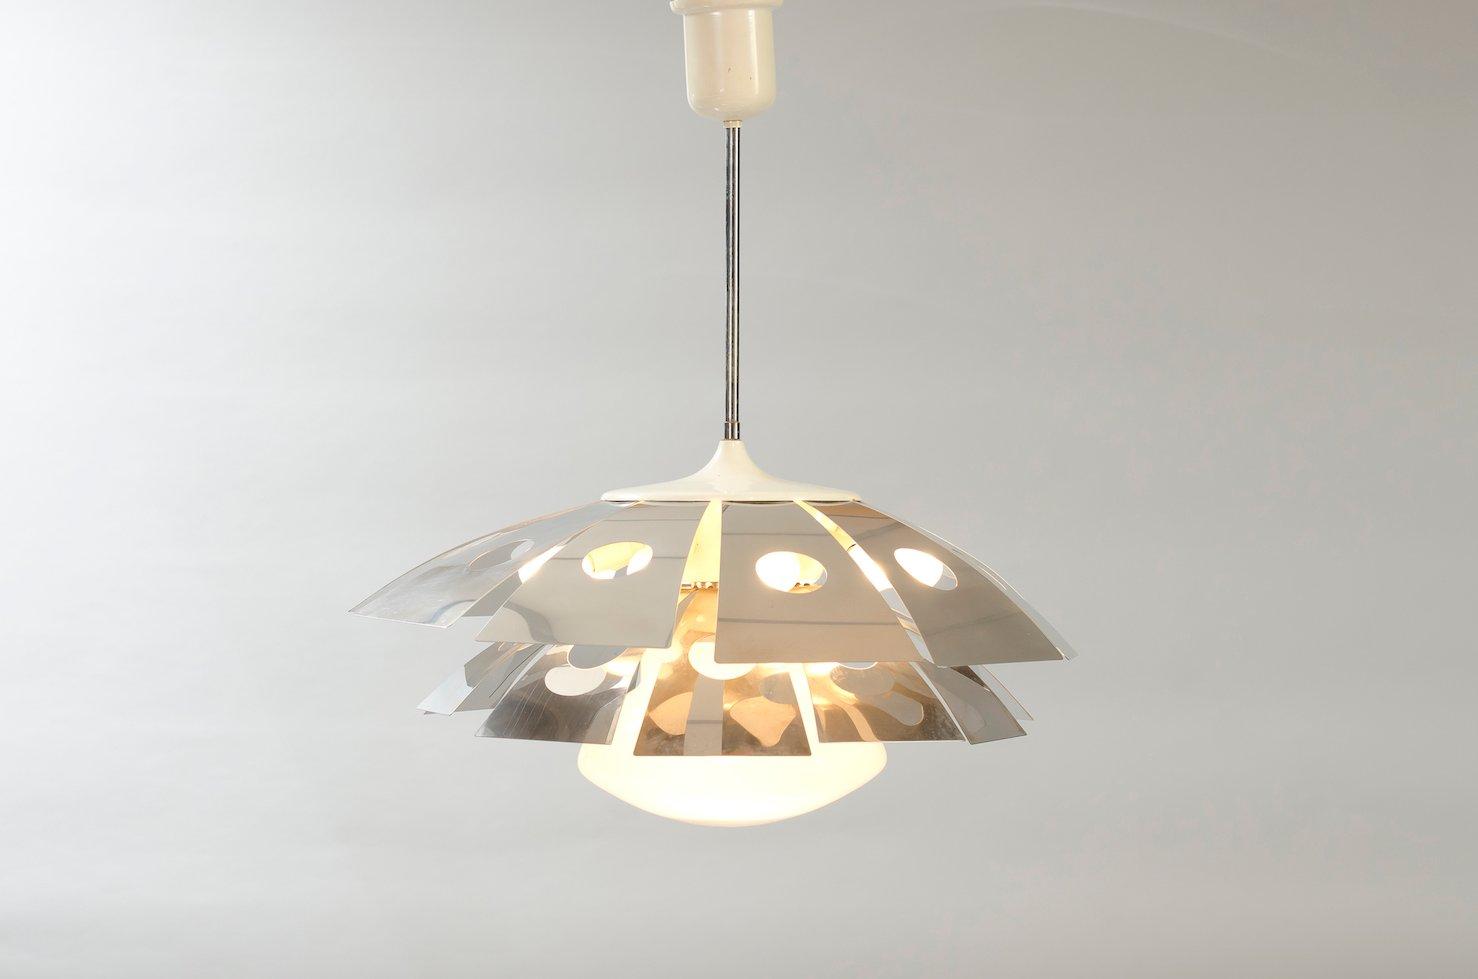 Bar lampada a sospensione ideal lux lampadari sospensione